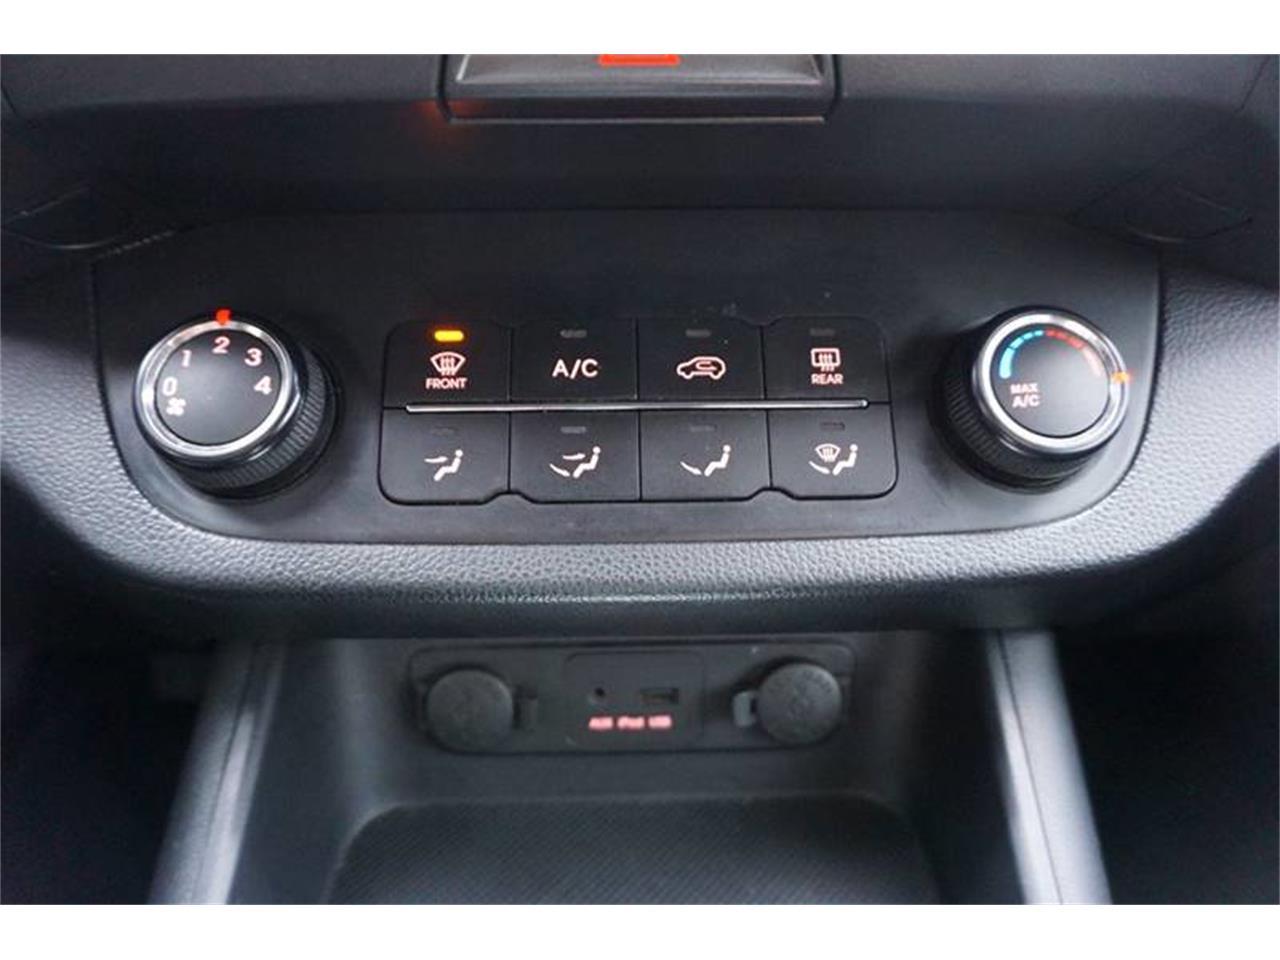 Large Picture of 2011 Kia Sportage - $7,400.00 Offered by Cincinnati Auto Wholesale - MODN